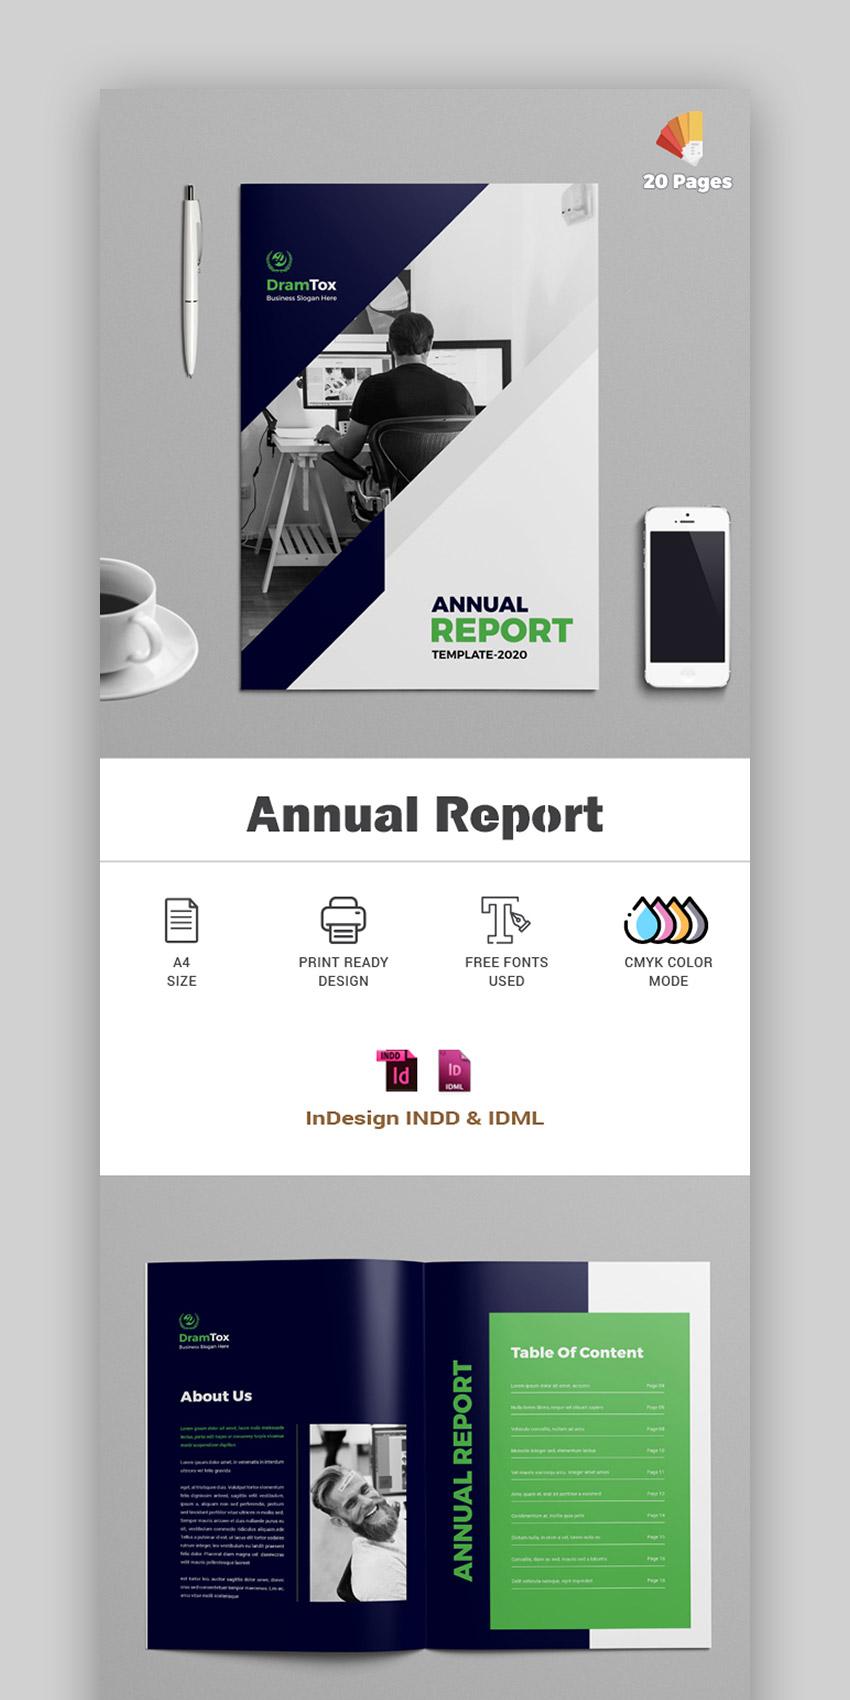 Annual Report Template 20202021